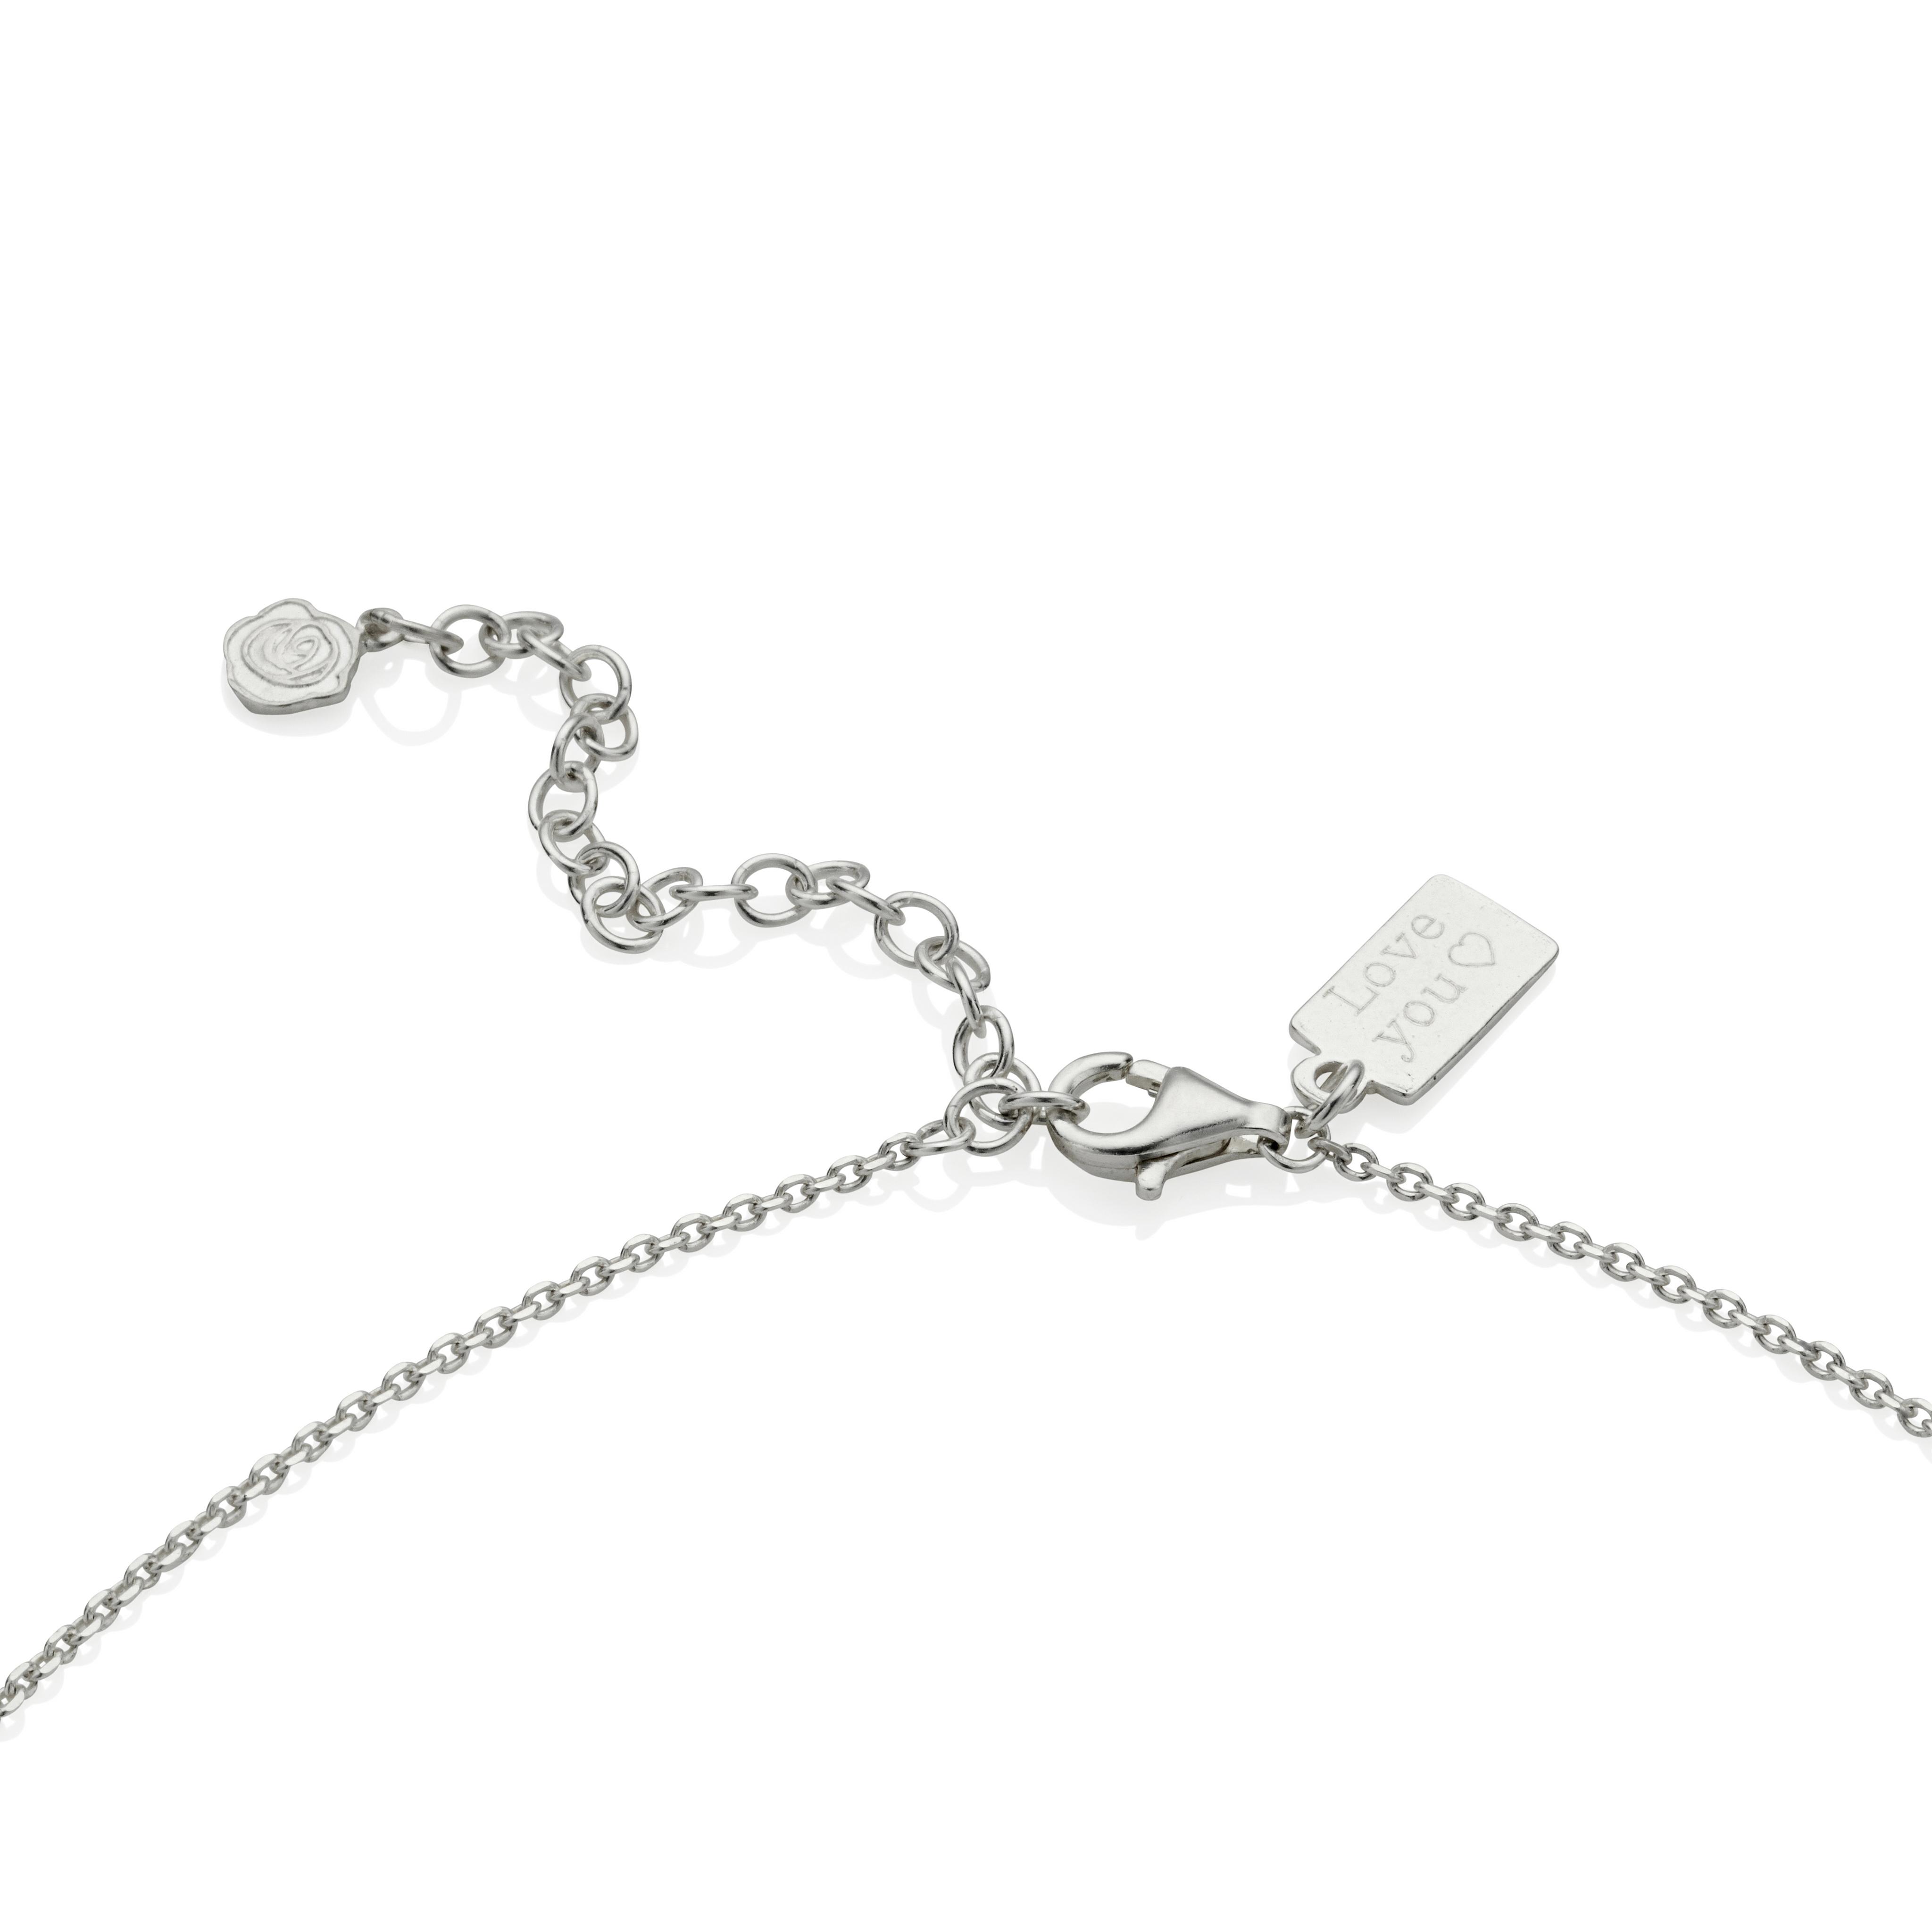 Tiny Tag necklace_1